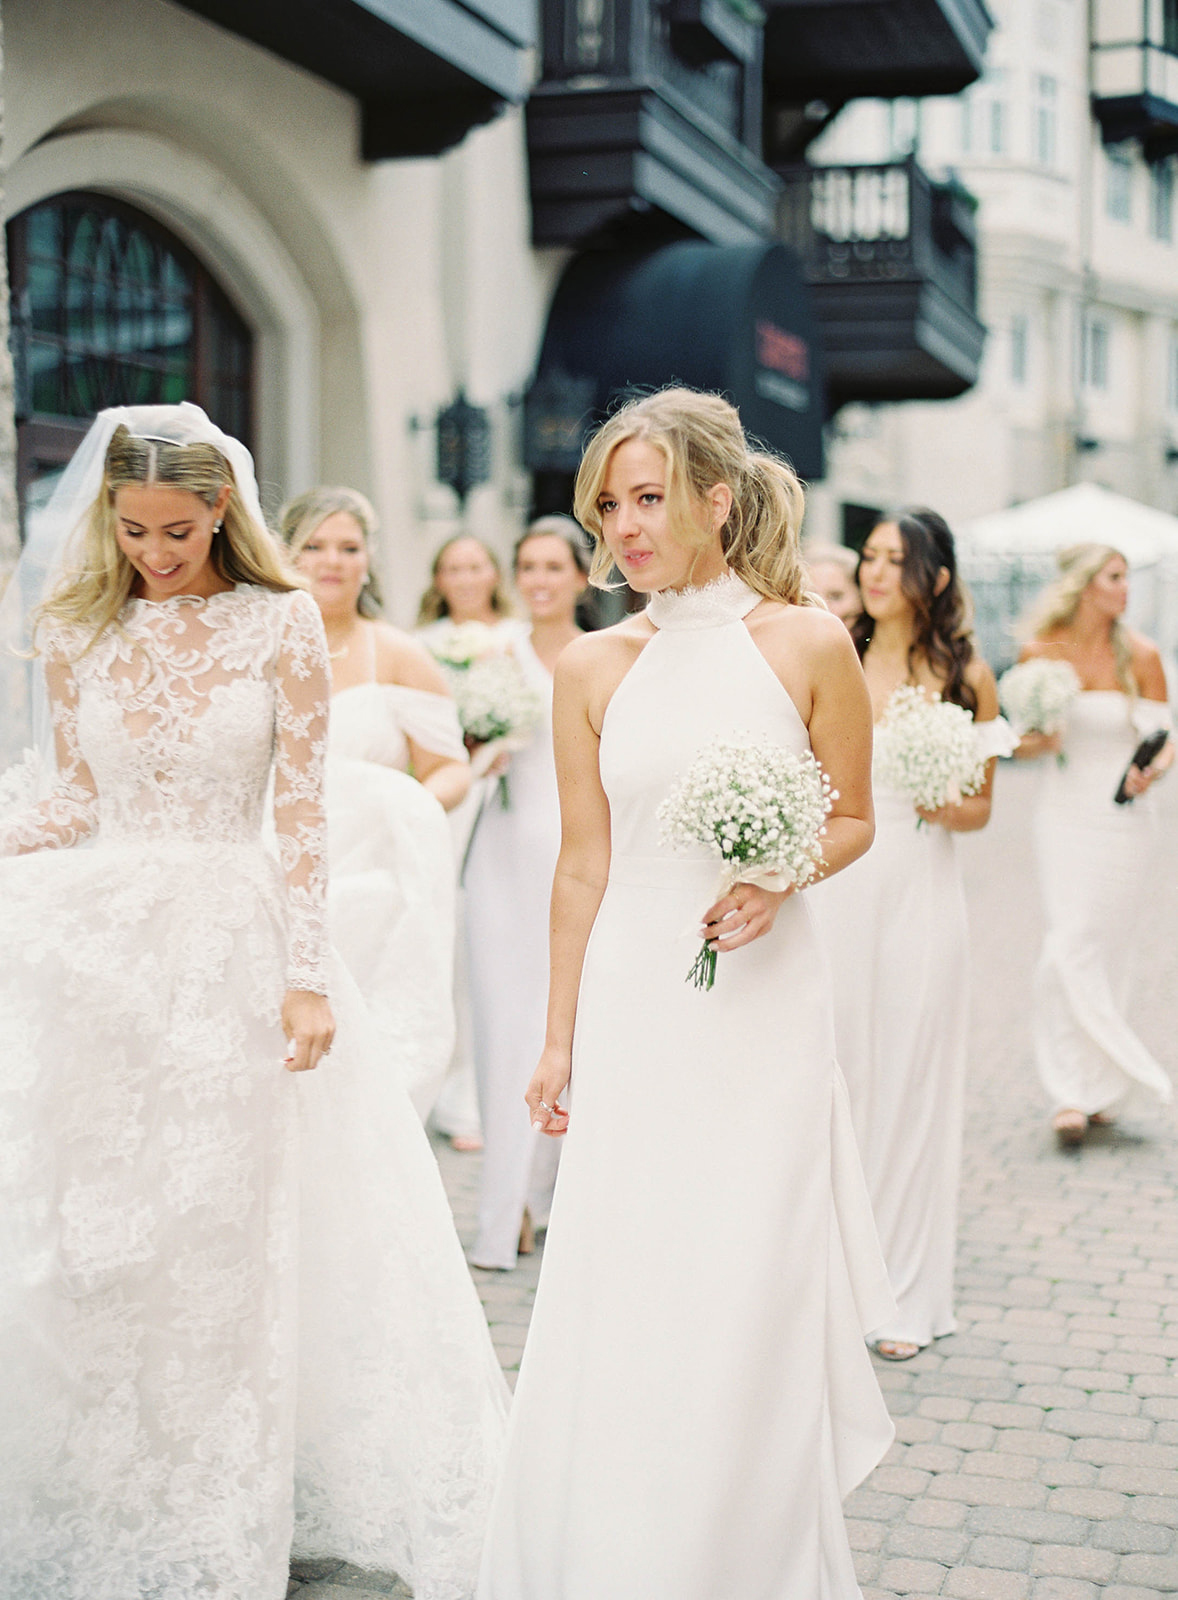 bride bridesmaids walking in white dresses